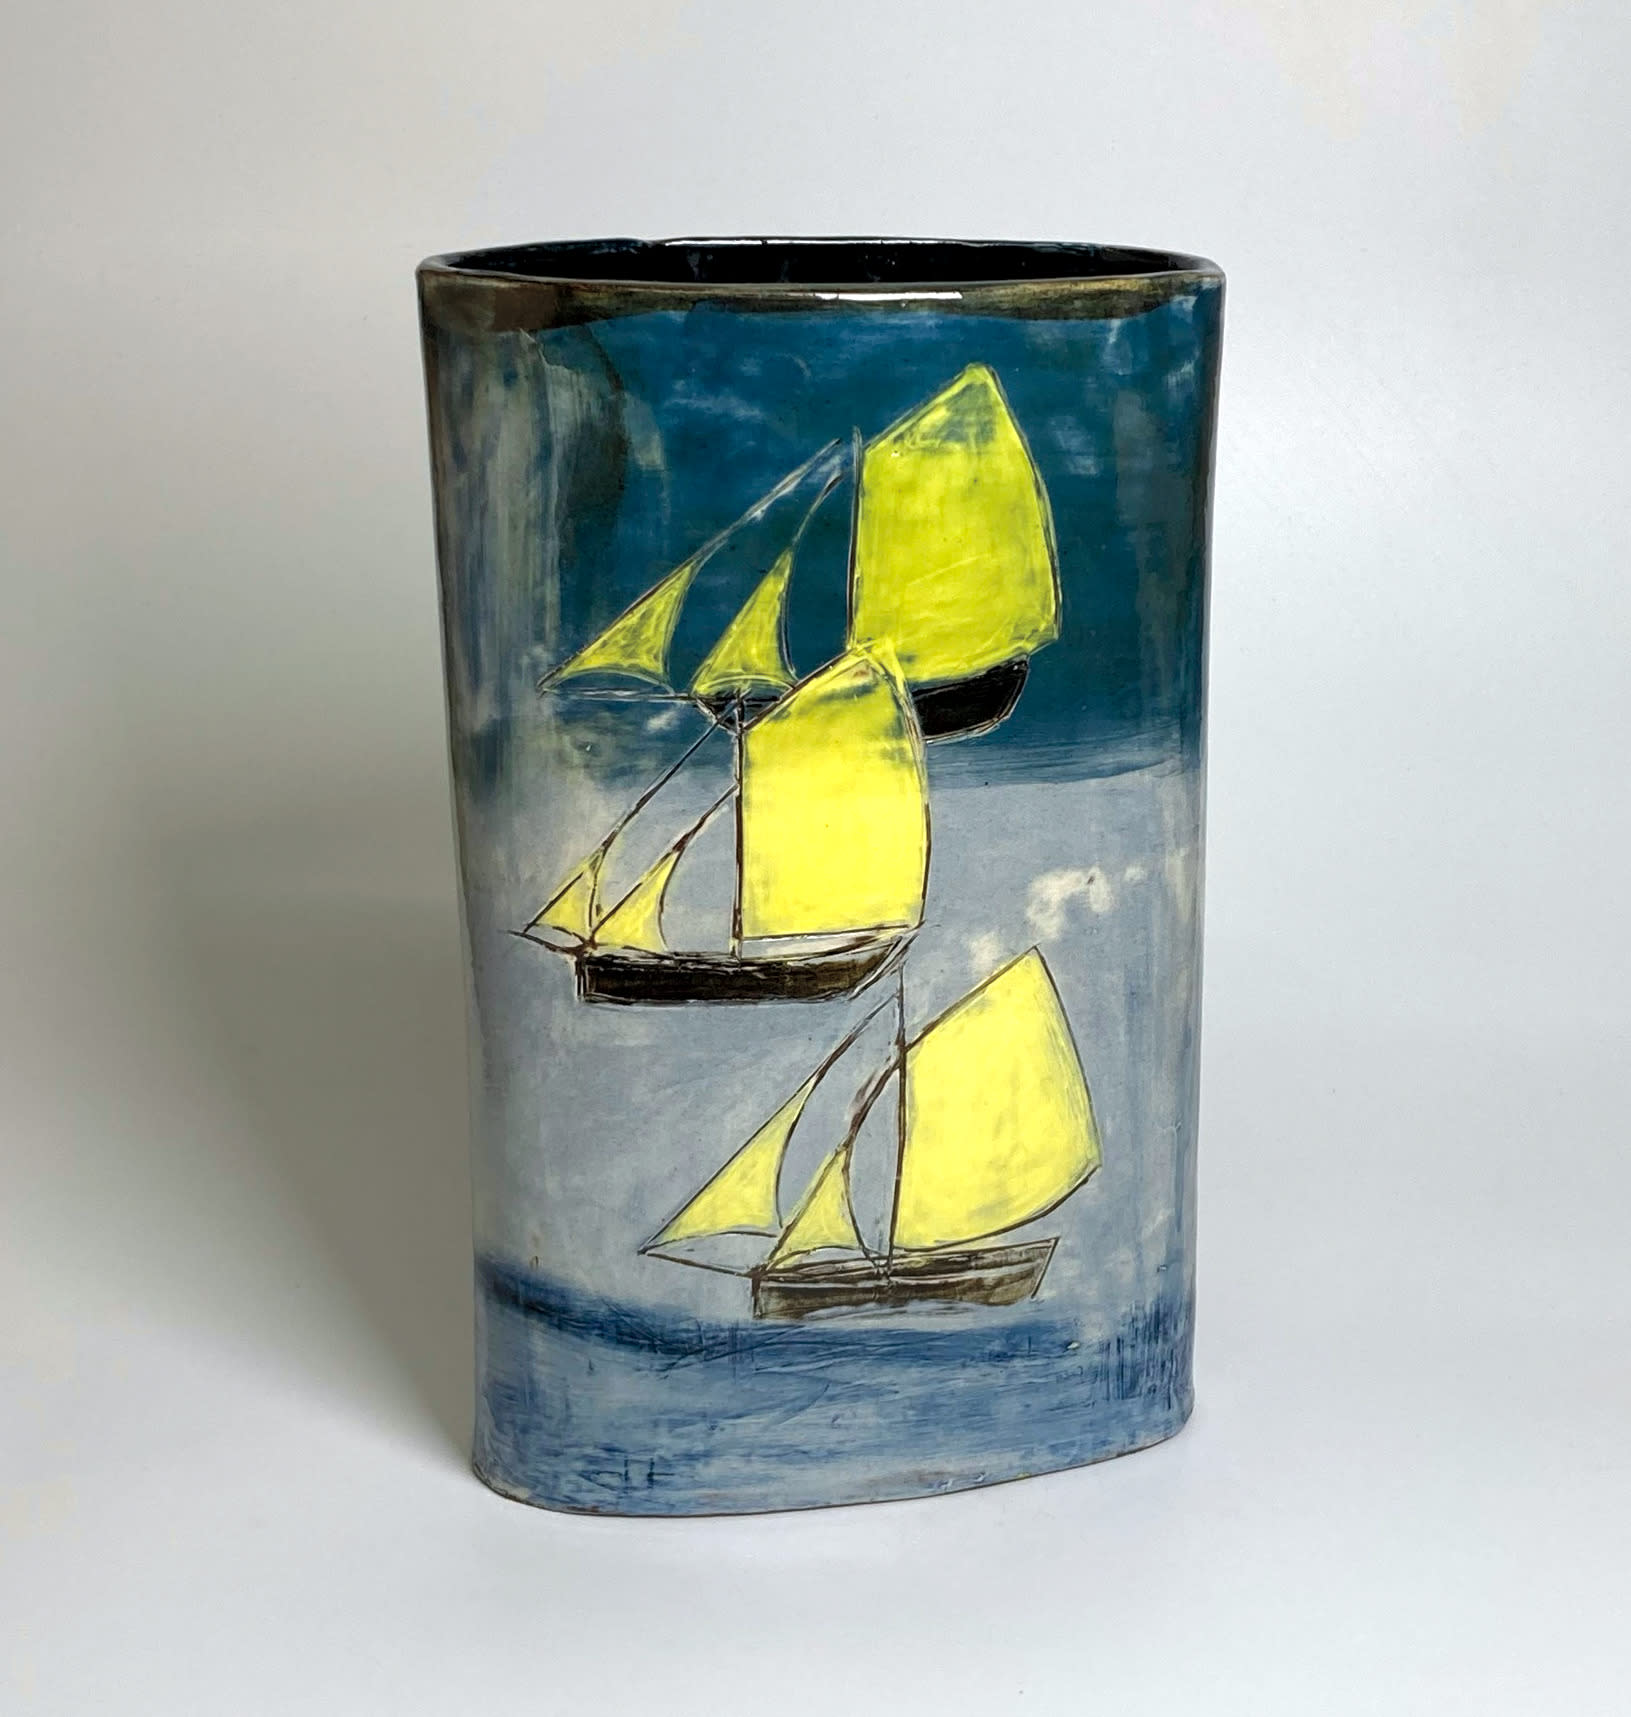 "<span class=""link fancybox-details-link""><a href=""/artists/428-anne-barrell/works/7699-anne-barrell-four-ships-2021/"">View Detail Page</a></span><div class=""artist""><strong>Anne Barrell</strong></div> <div class=""title""><em>Four Ships</em>, 2021</div> <div class=""medium"">handmade, hand-painted ceramic </div> <div class=""dimensions"">h. 25 x w. 16 x d. 9 cm </div><div class=""copyright_line"">Own Art: £26 x 10 Months, 0% APR</div>"